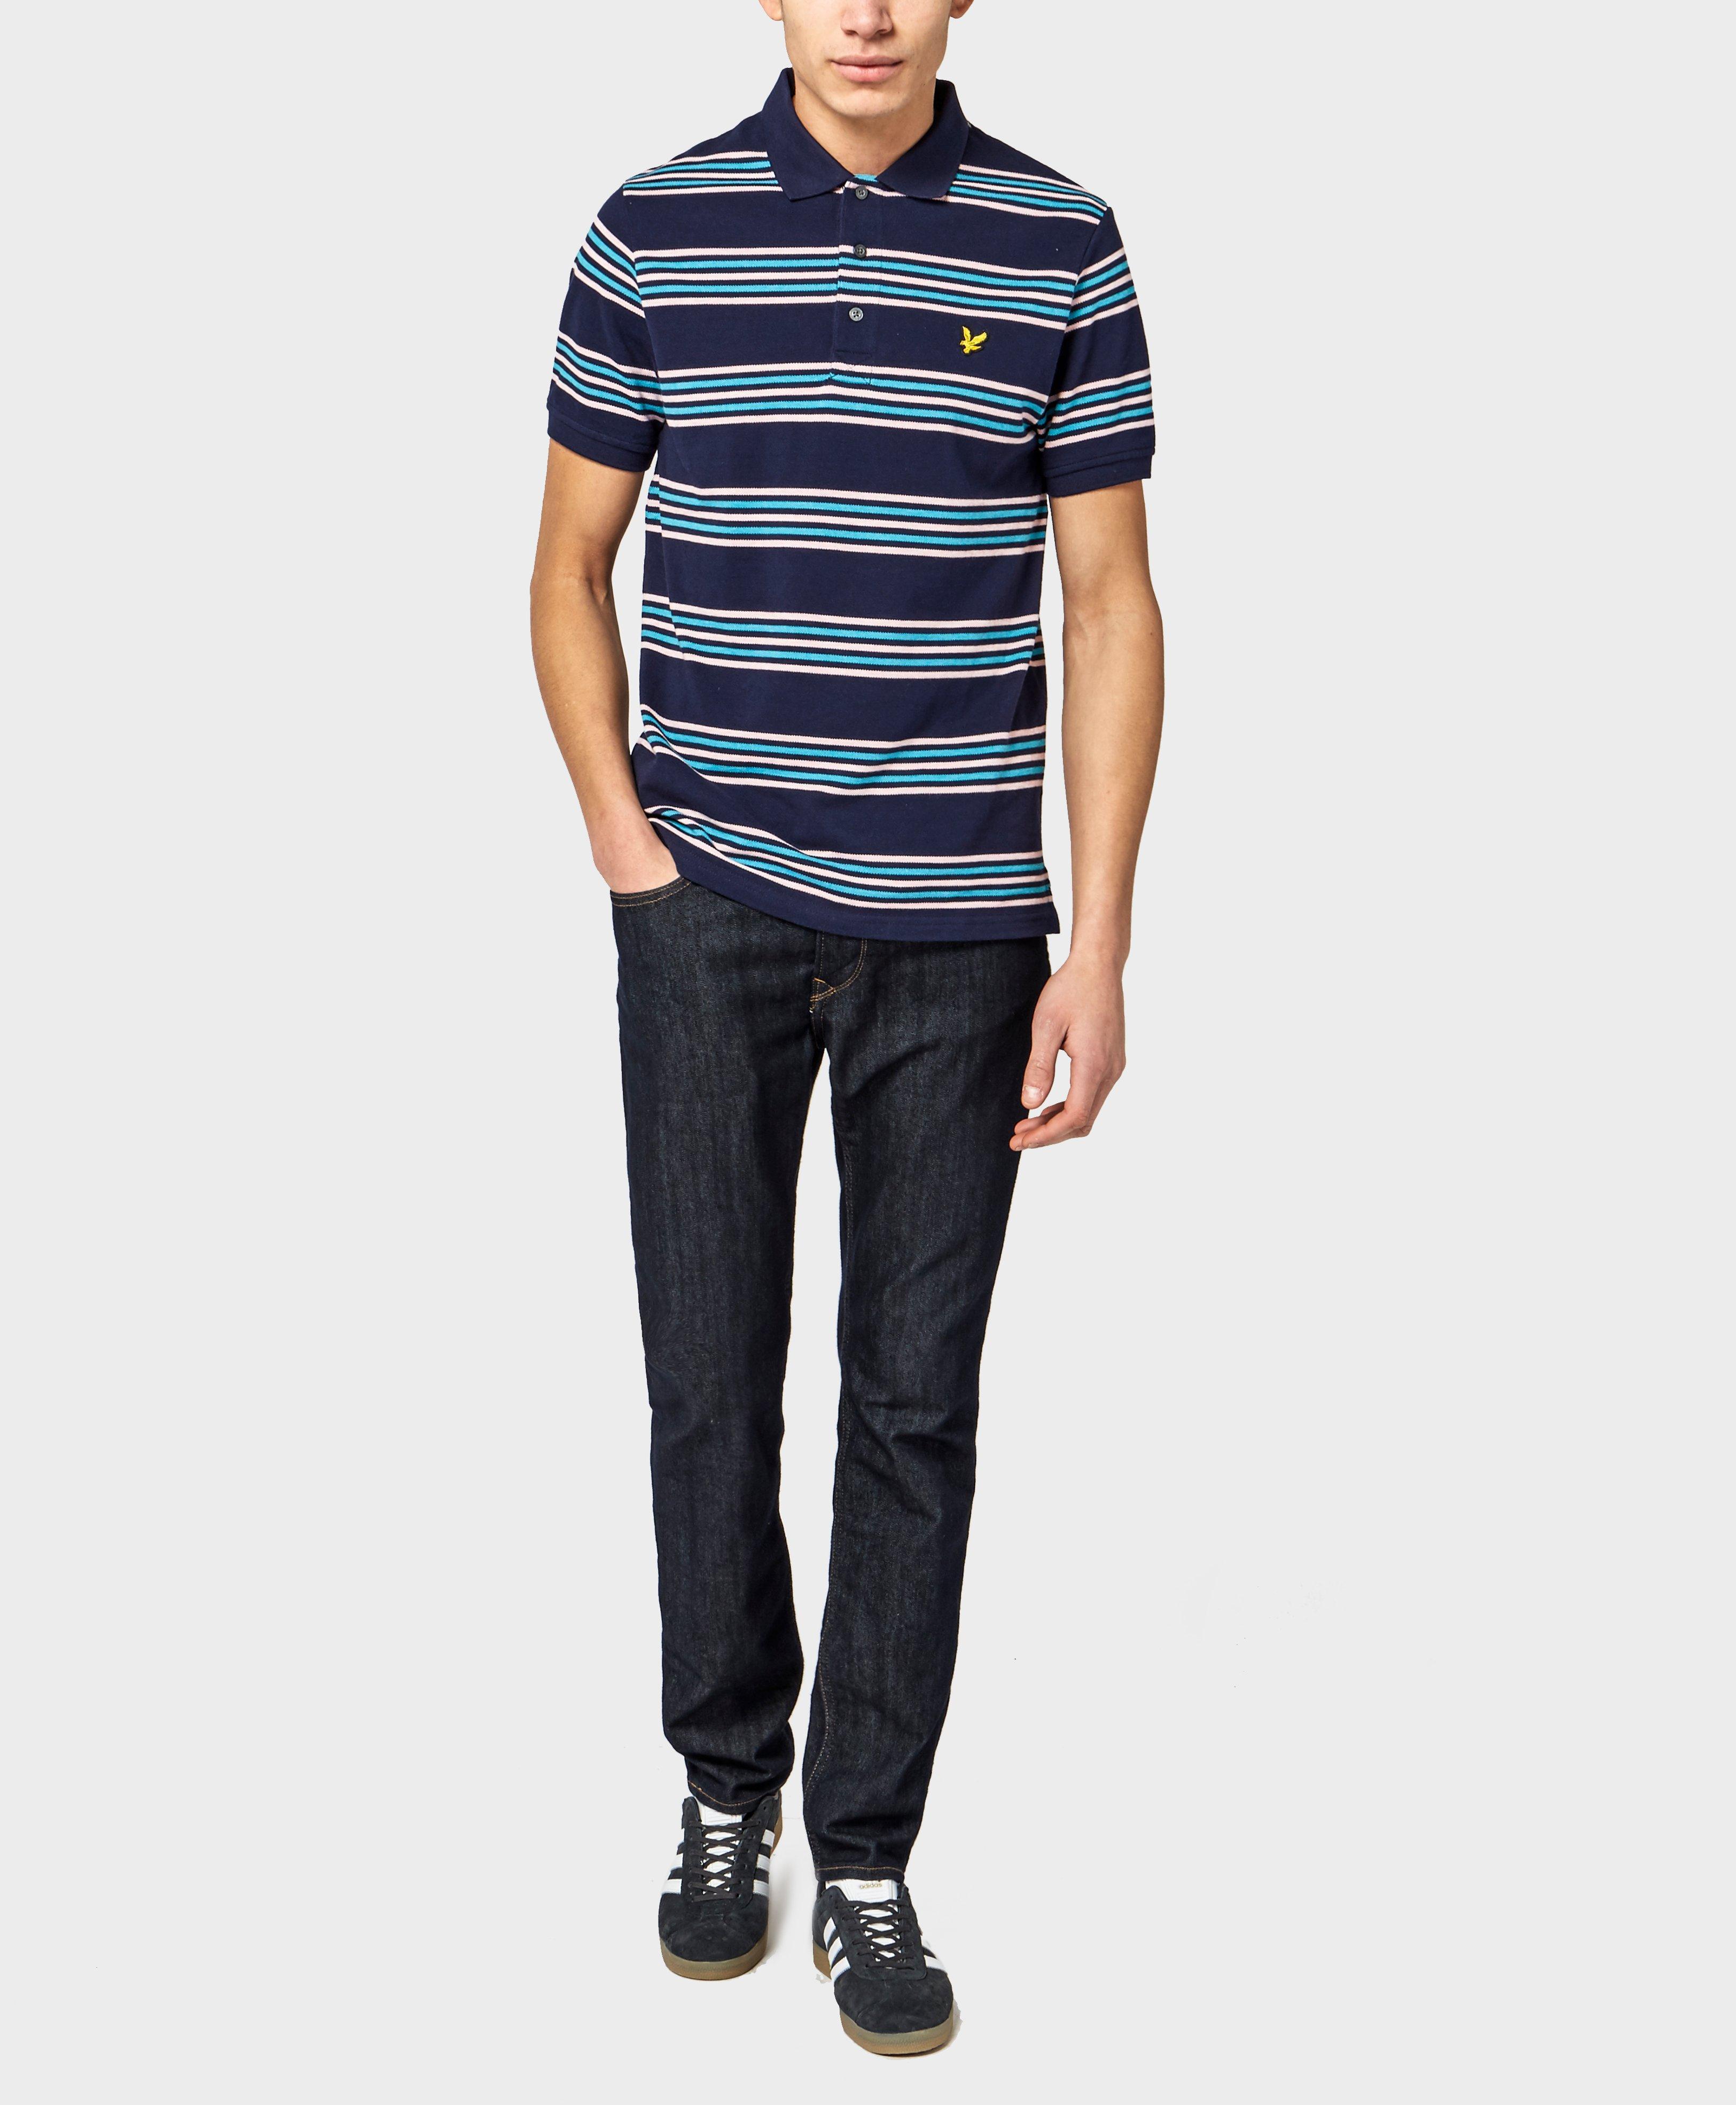 Lyle scott horizontal stripe polo shirt in blue for men for Horizontal striped dress shirts men